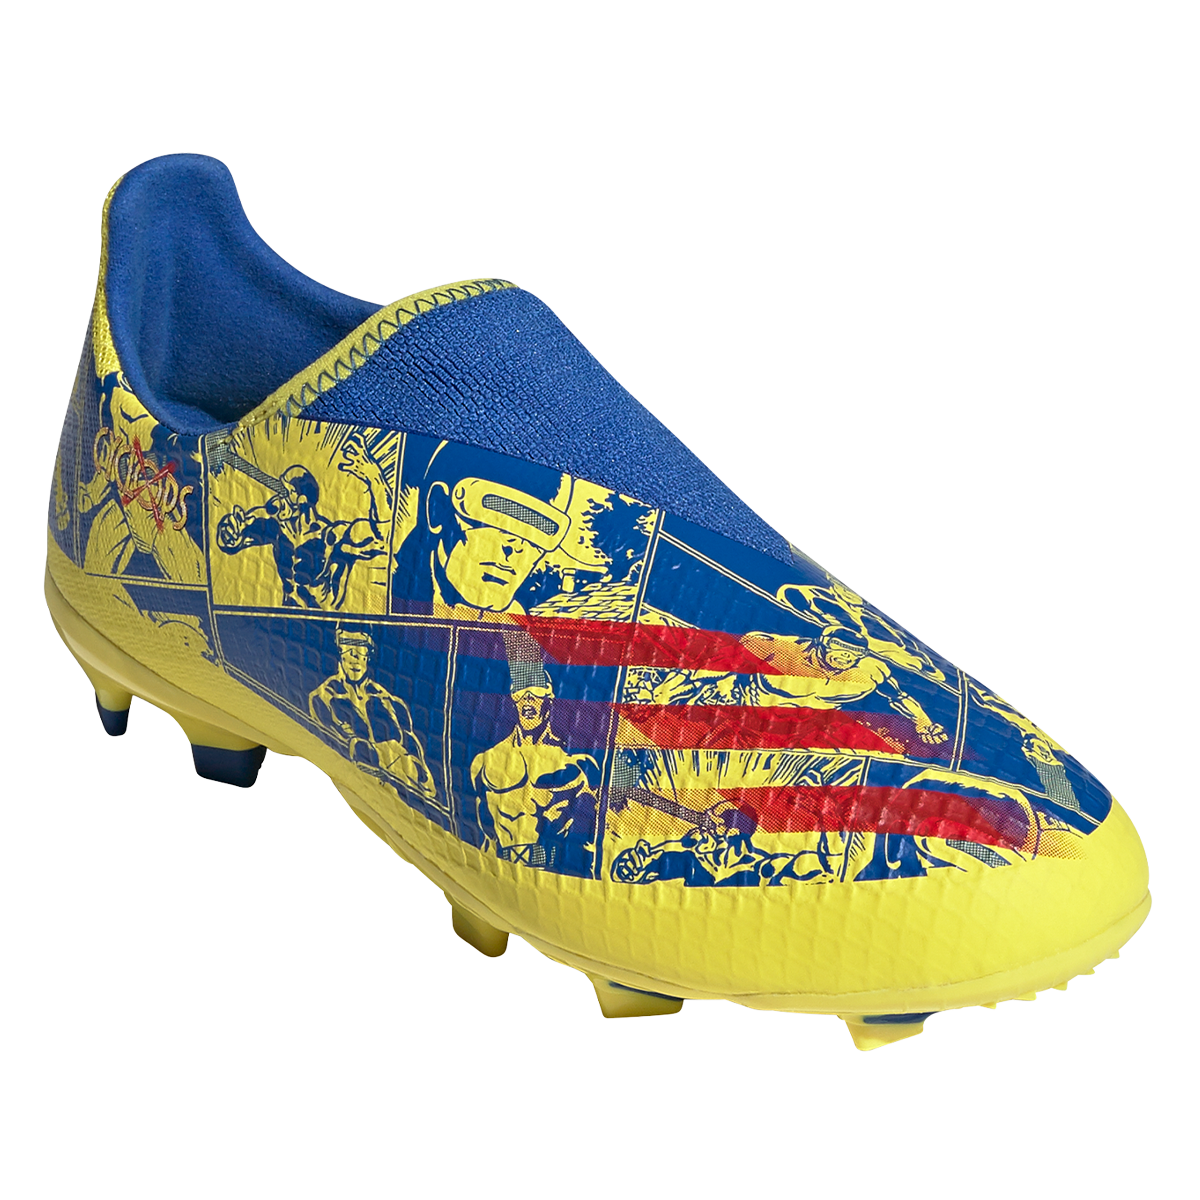 Chaussure de football adidas pour enfants X Ghosted.3 FG LL bleu / jaune